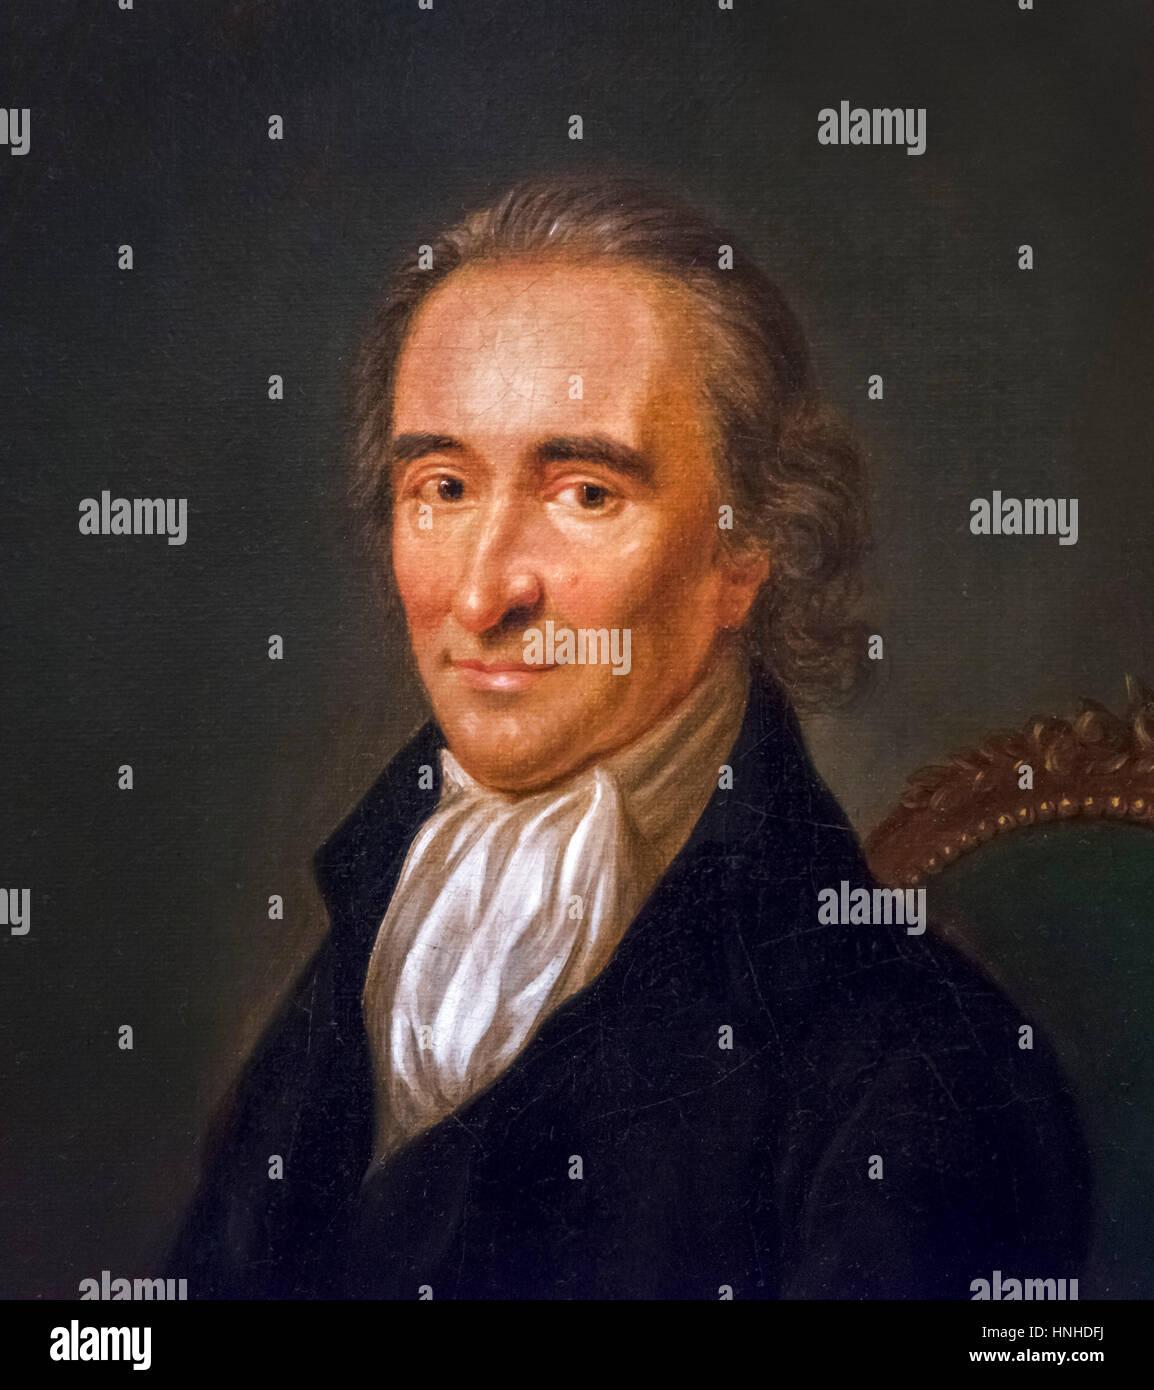 Thomas Paine The English Born Activist And Philosopher